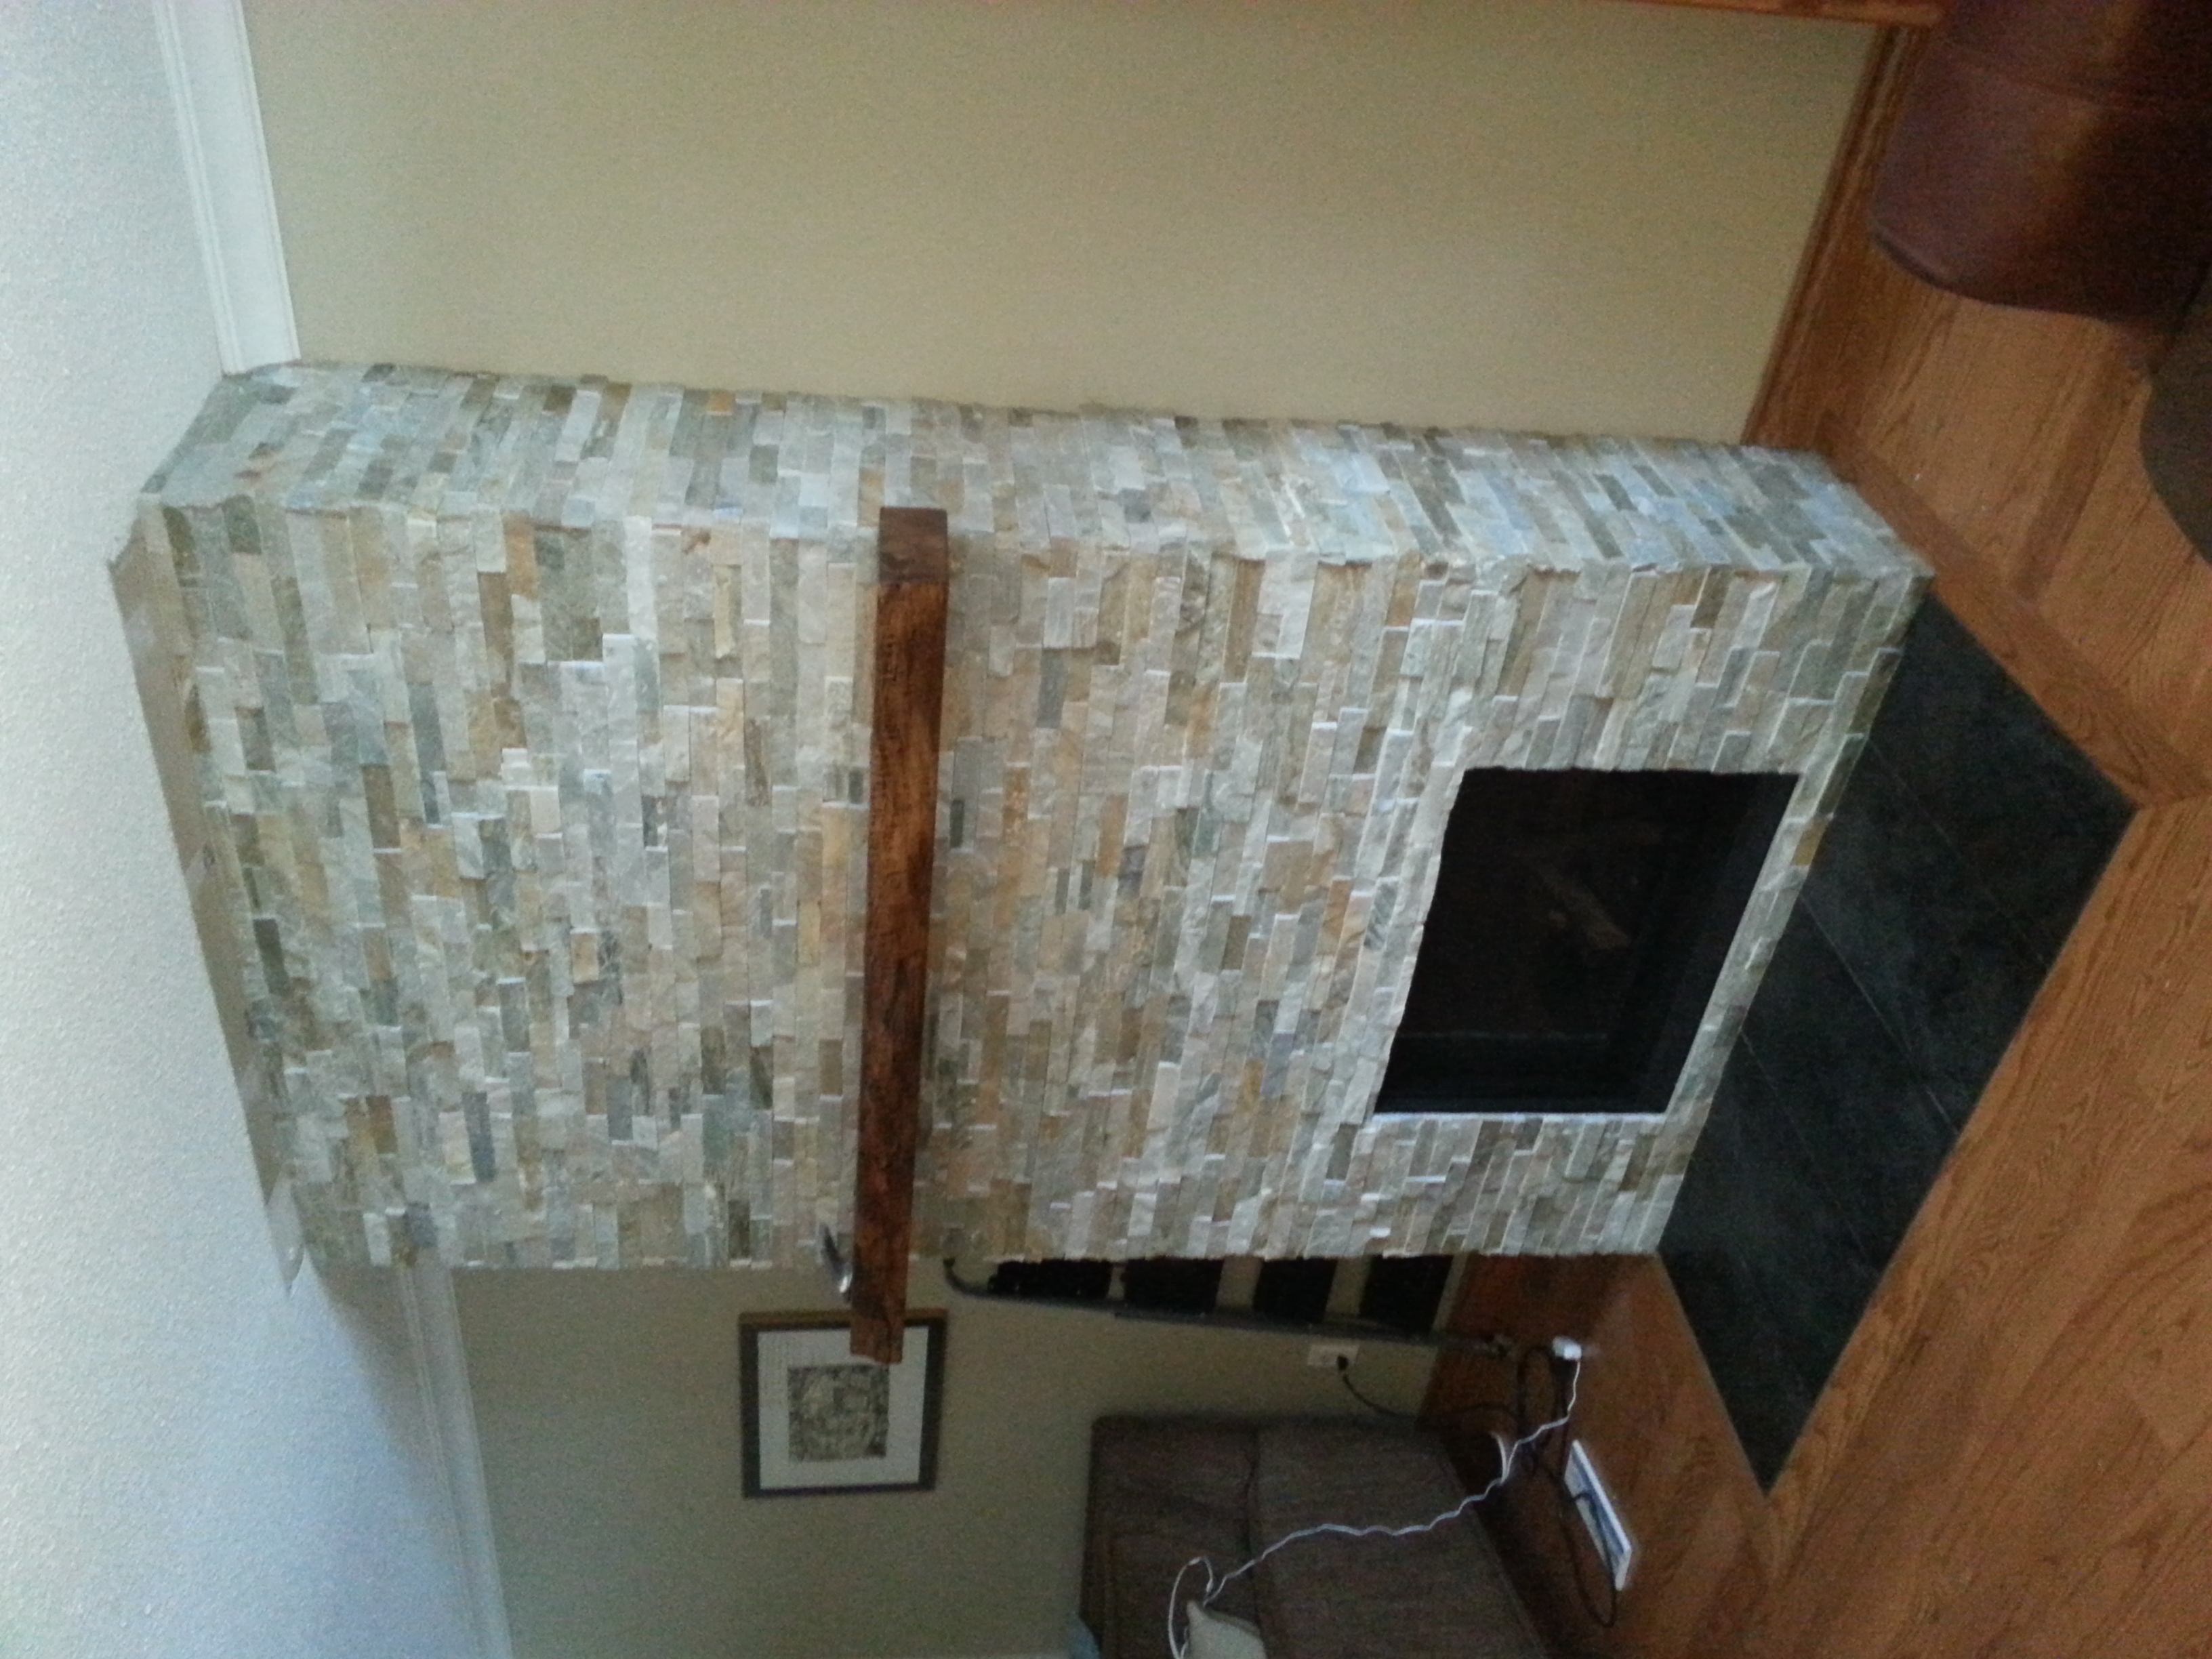 Tile Contractors Work - Fire Place (1).jpg